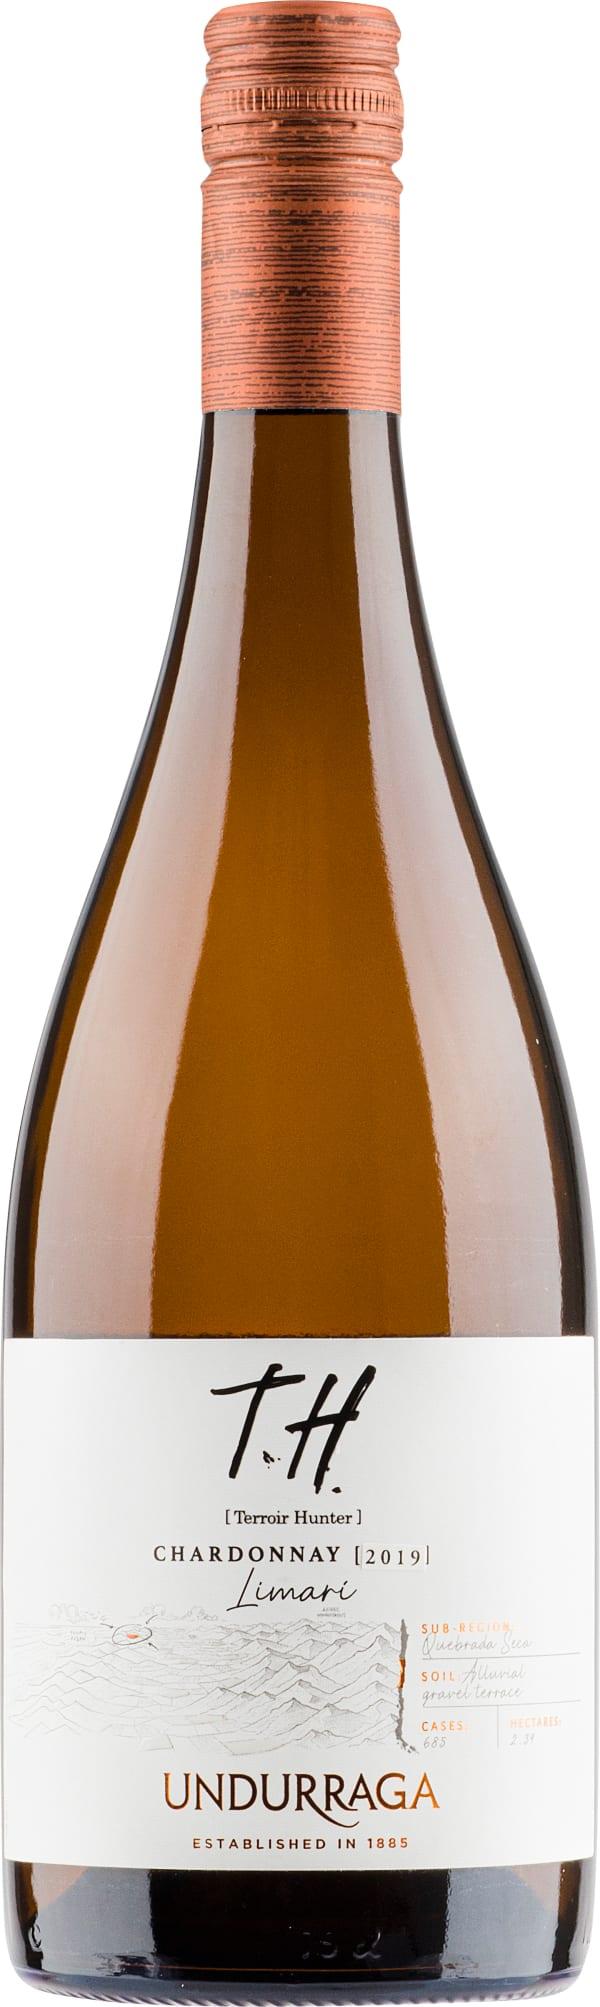 T.H. Chardonnay 2019